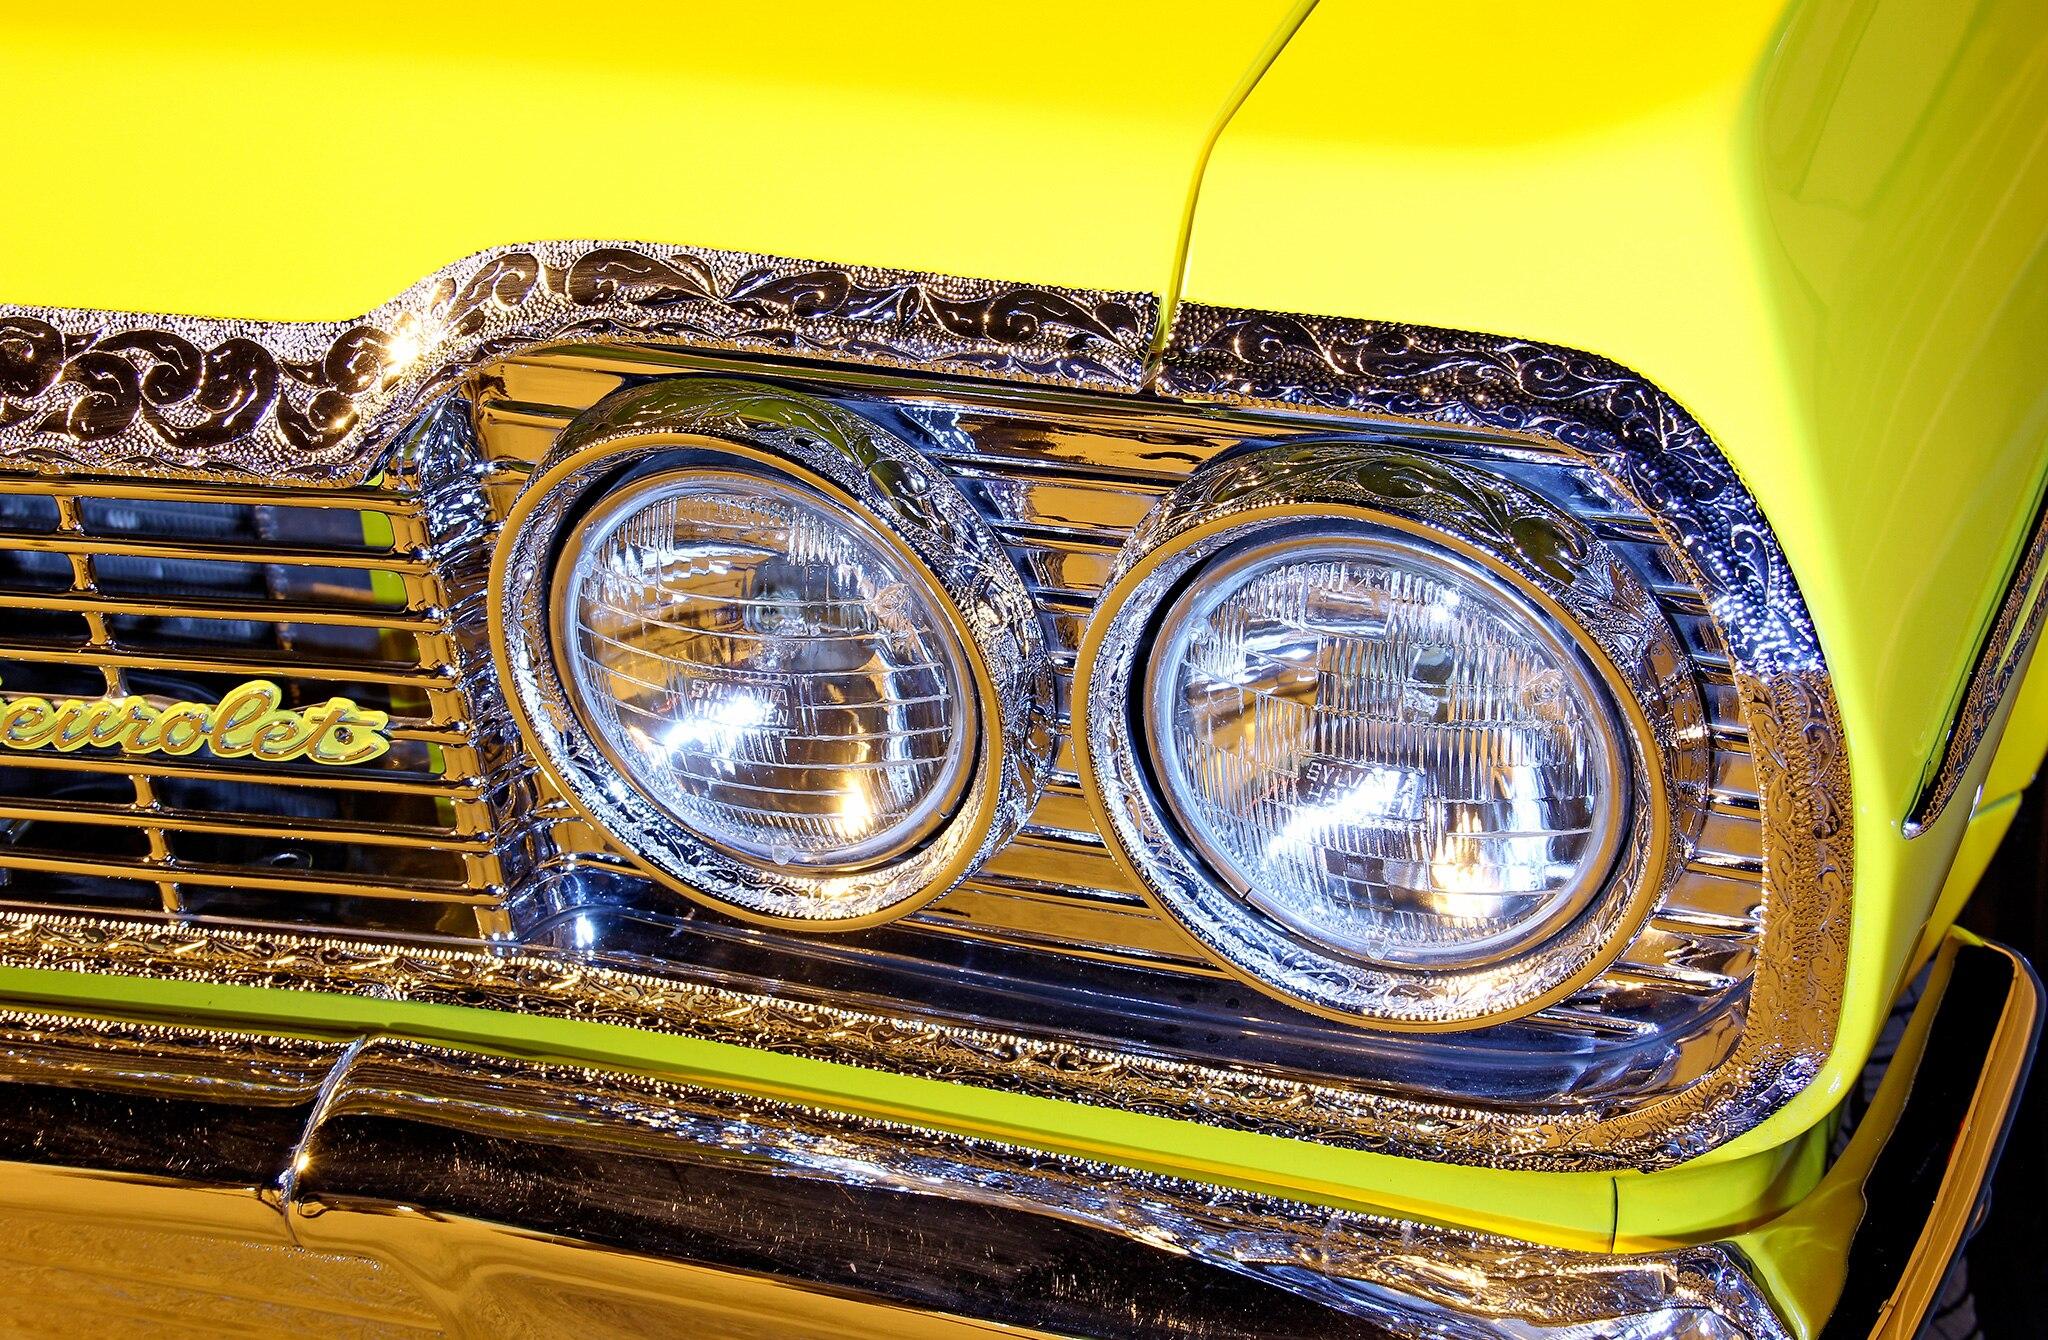 1964 Chevrolet Impala Convertible Canadian Convertible